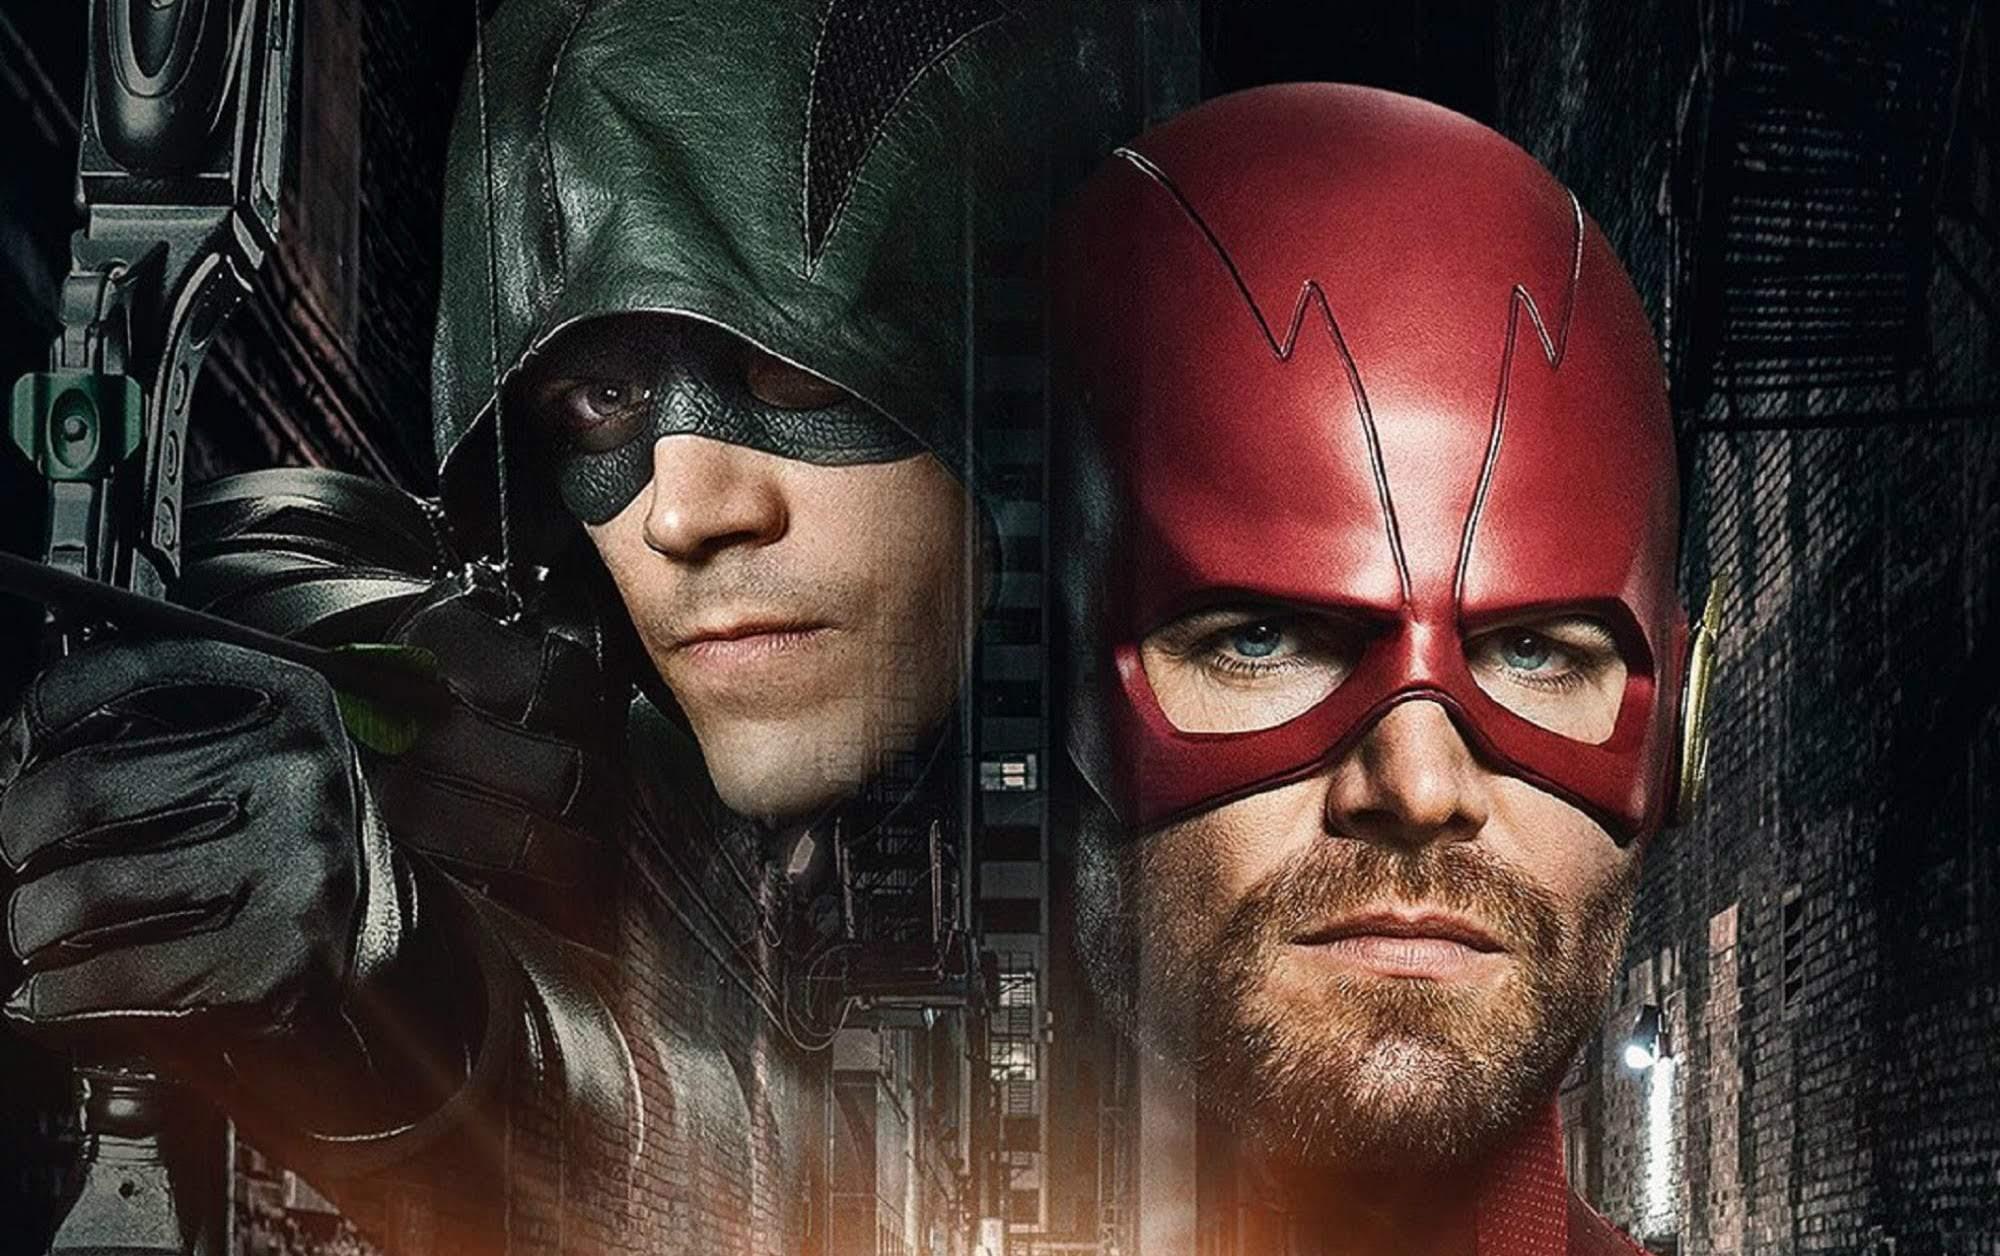 Arrowverse Crossover ELSEWORLDS Teaser Trailer : DC コミックスのヒーロー・ドラマ、アローバースのクロスオーバー特番「エルスワールズ」が、アローのオリバーが目覚めると、ザ・フラッシュのバリーになっていた予告編をリリース ! !